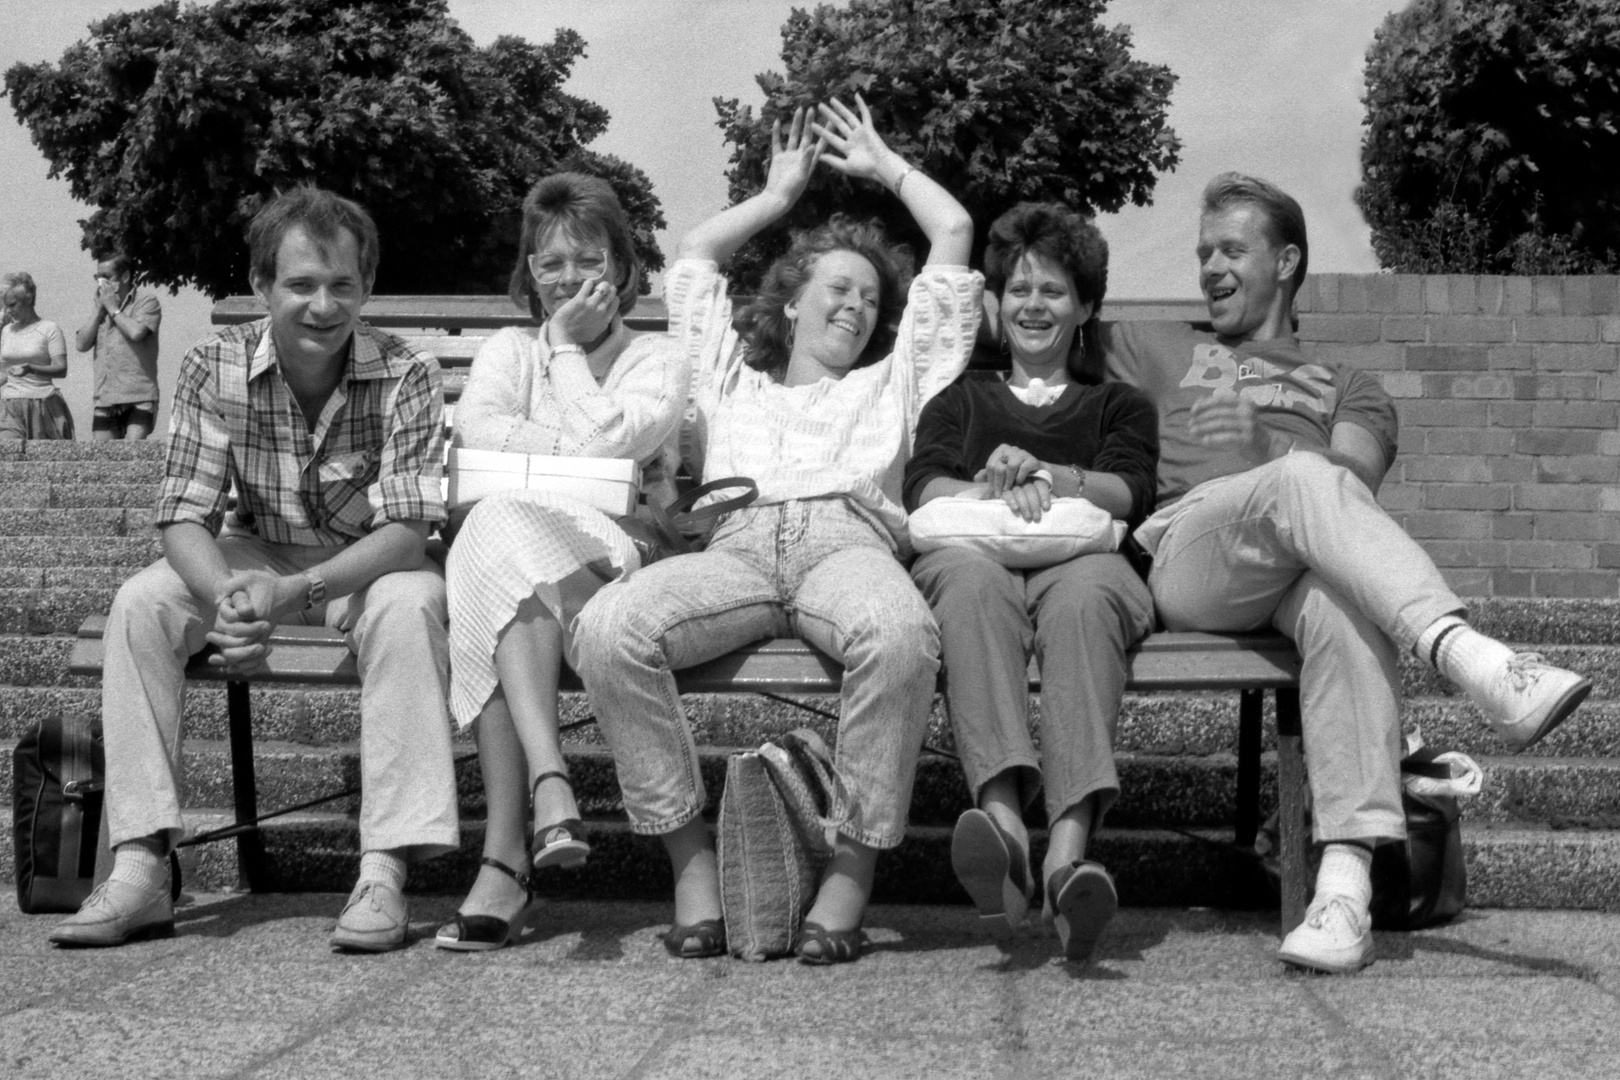 Sommer 1988 in Potsdam